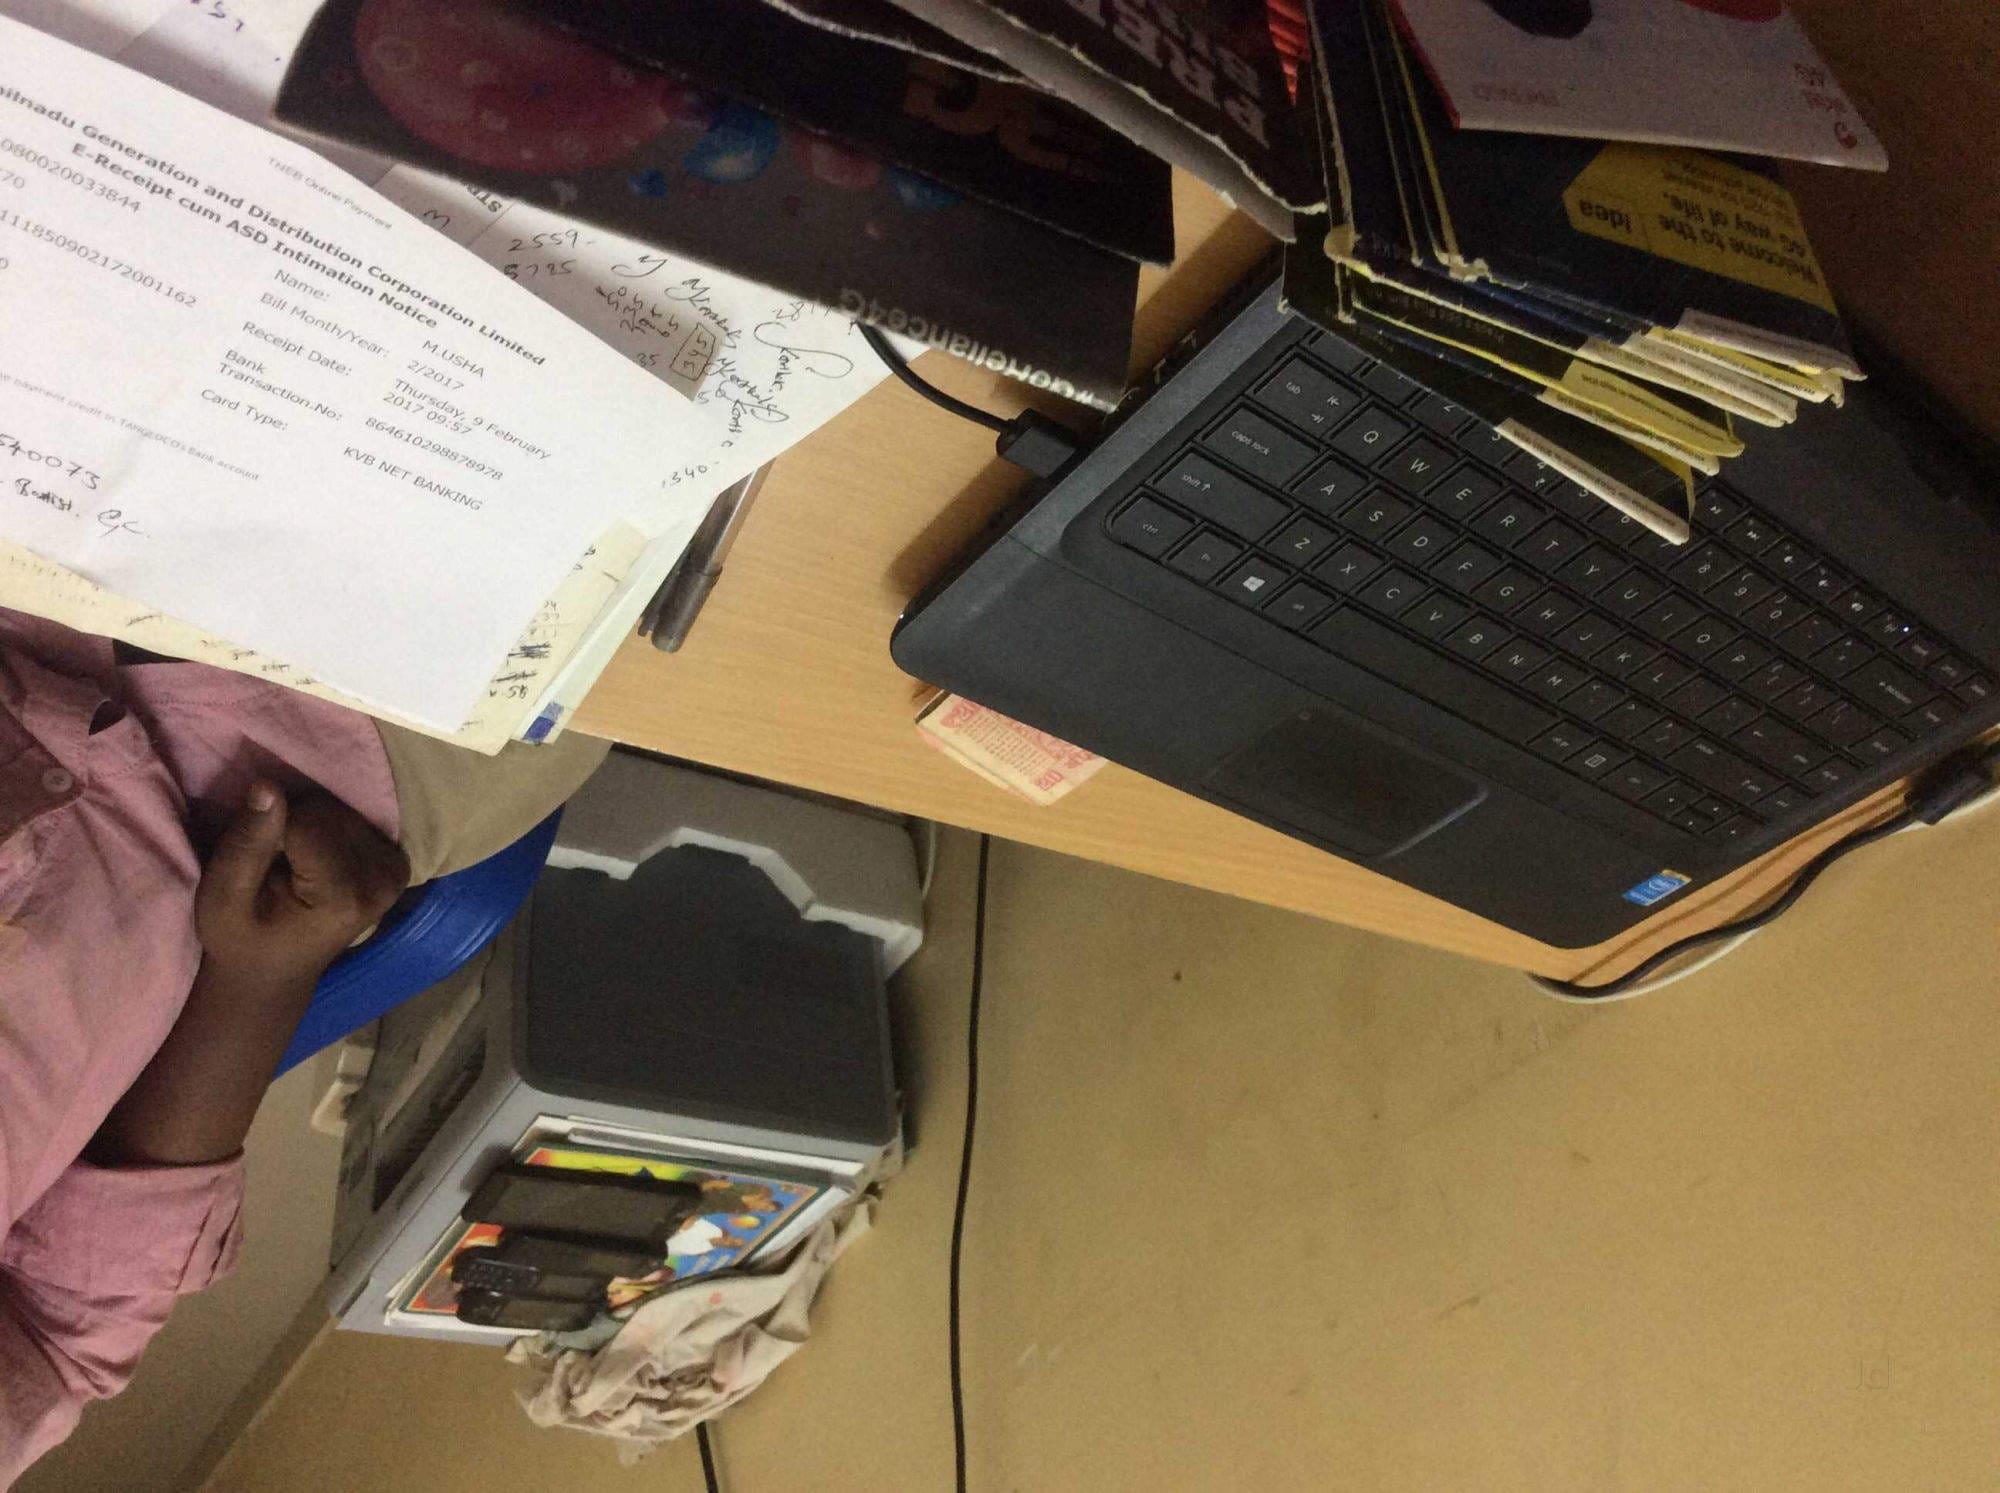 Top Bsnl Mobile Phone Recharge Coupon Dealers in Dharmapuri